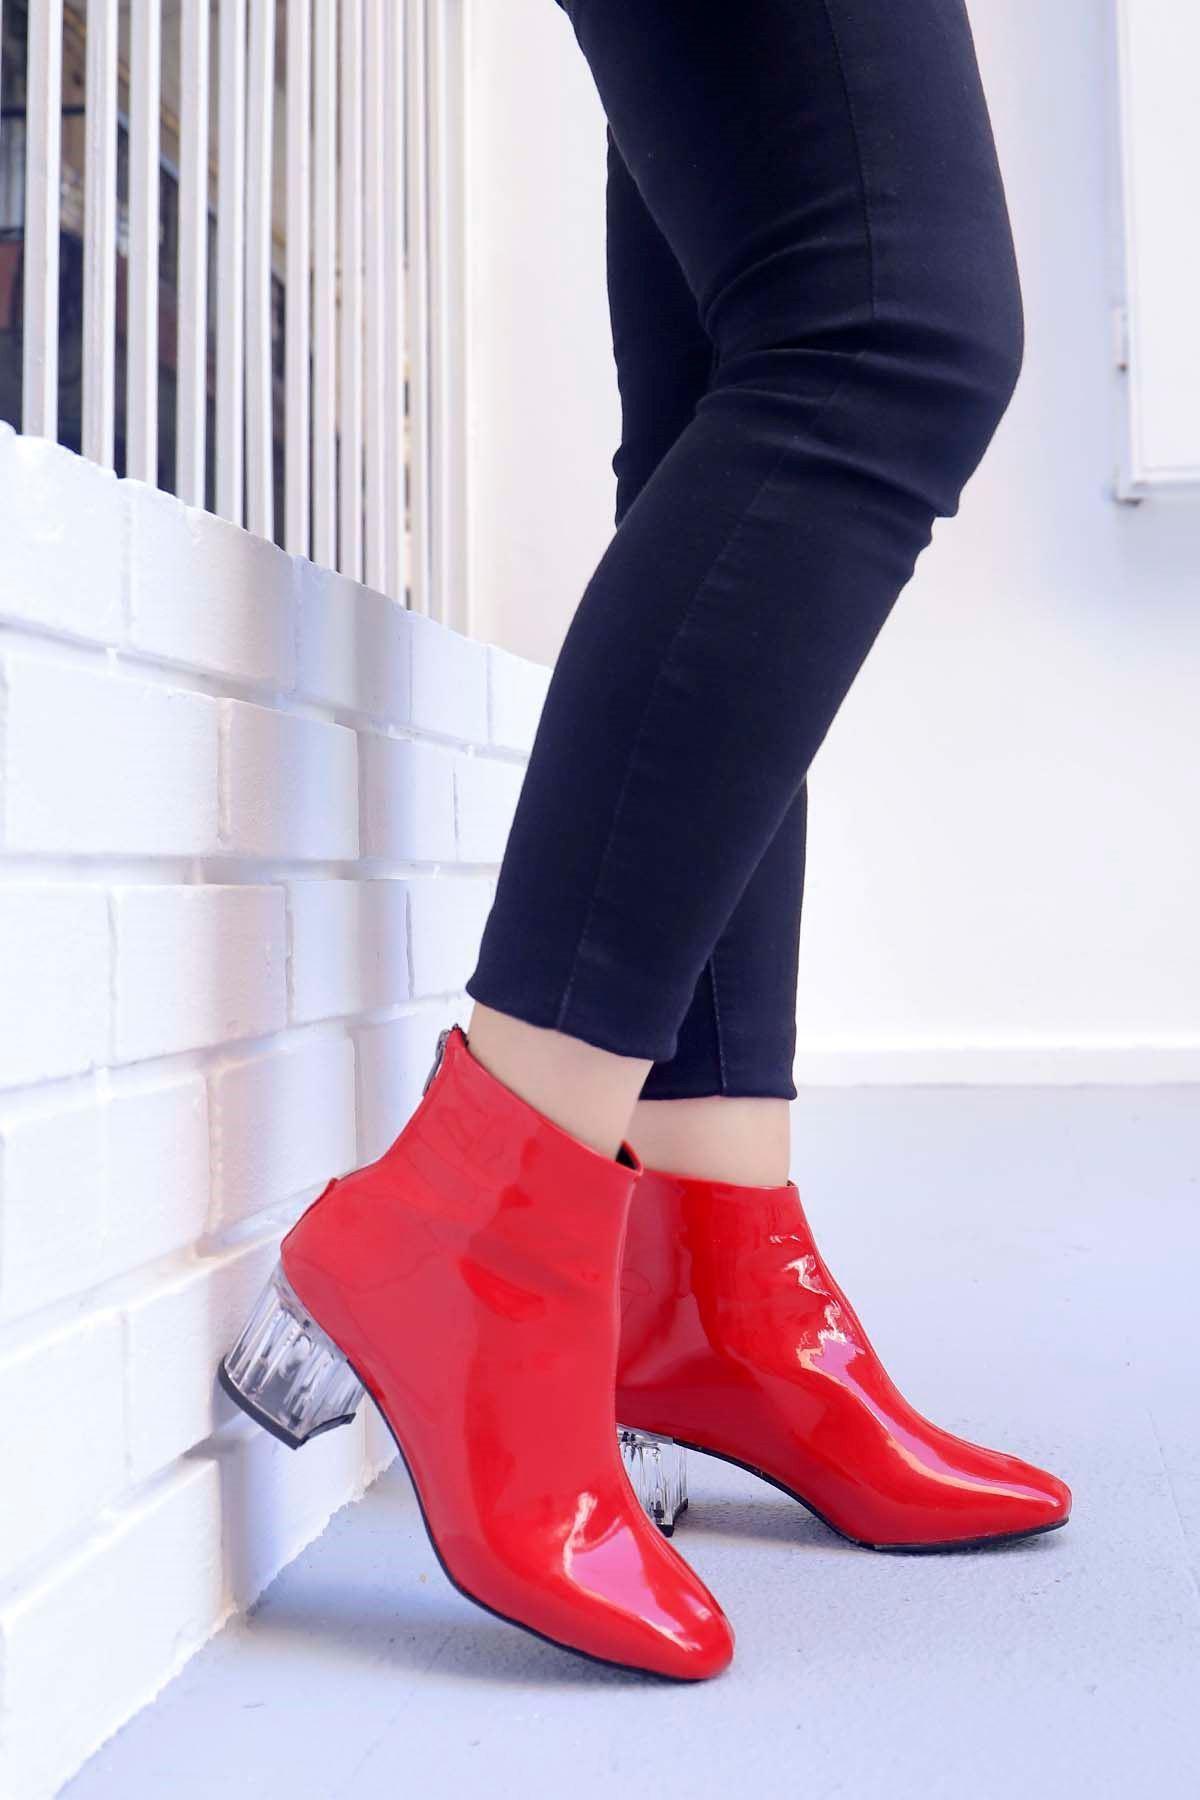 mami-Şeffaf Topuk Küt Burun Topuklu Bot Kırmızı Rugan